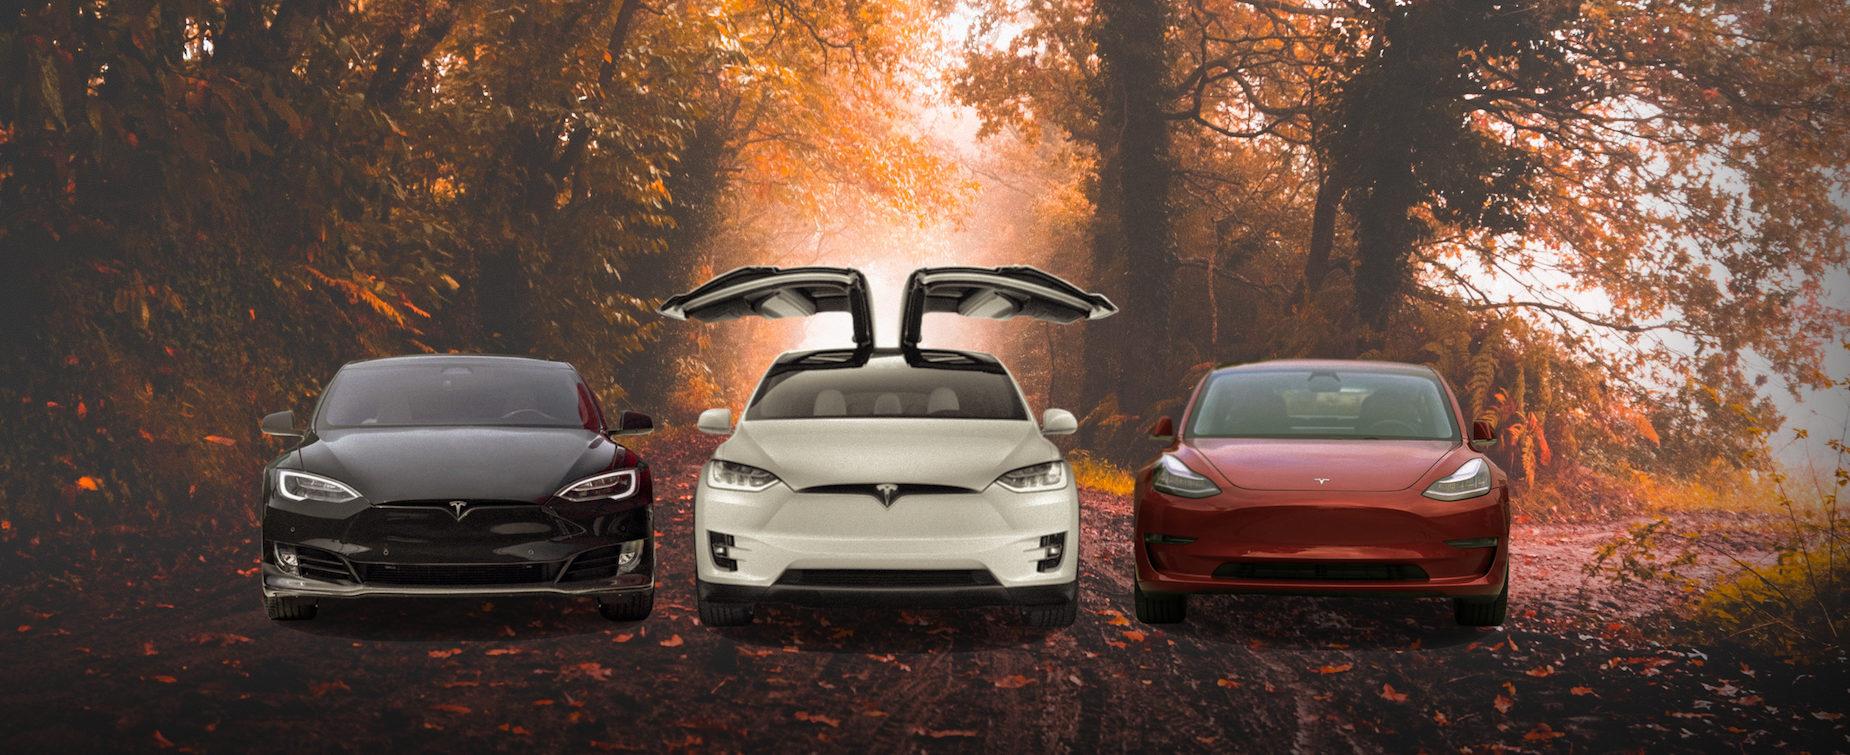 Autumn-Scene-with-3-Tesla